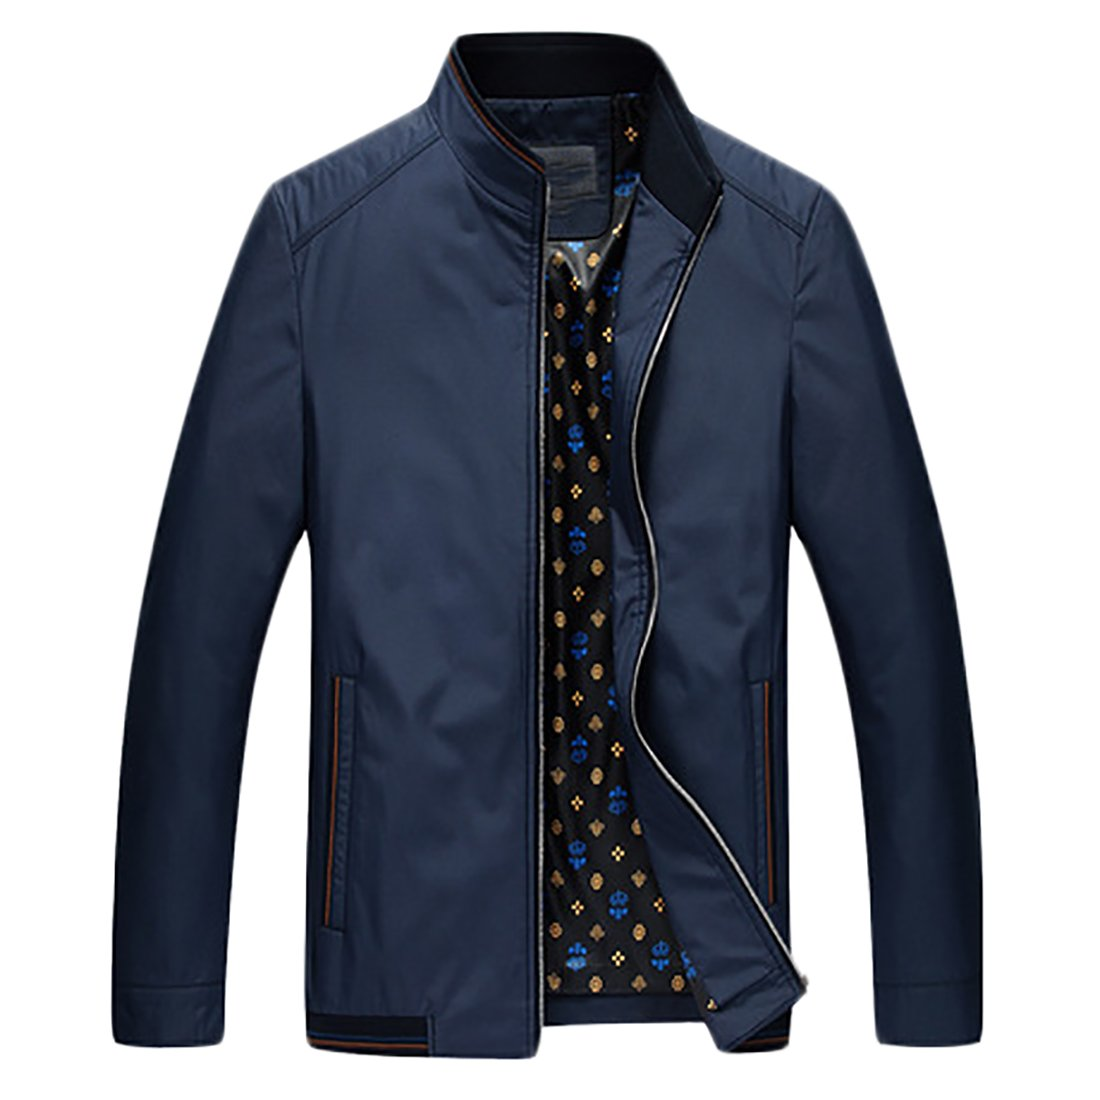 Nanquan Men Plus Size Zip-up Stand Collar Lightweight Faux Fur Lined Fleece Jackets